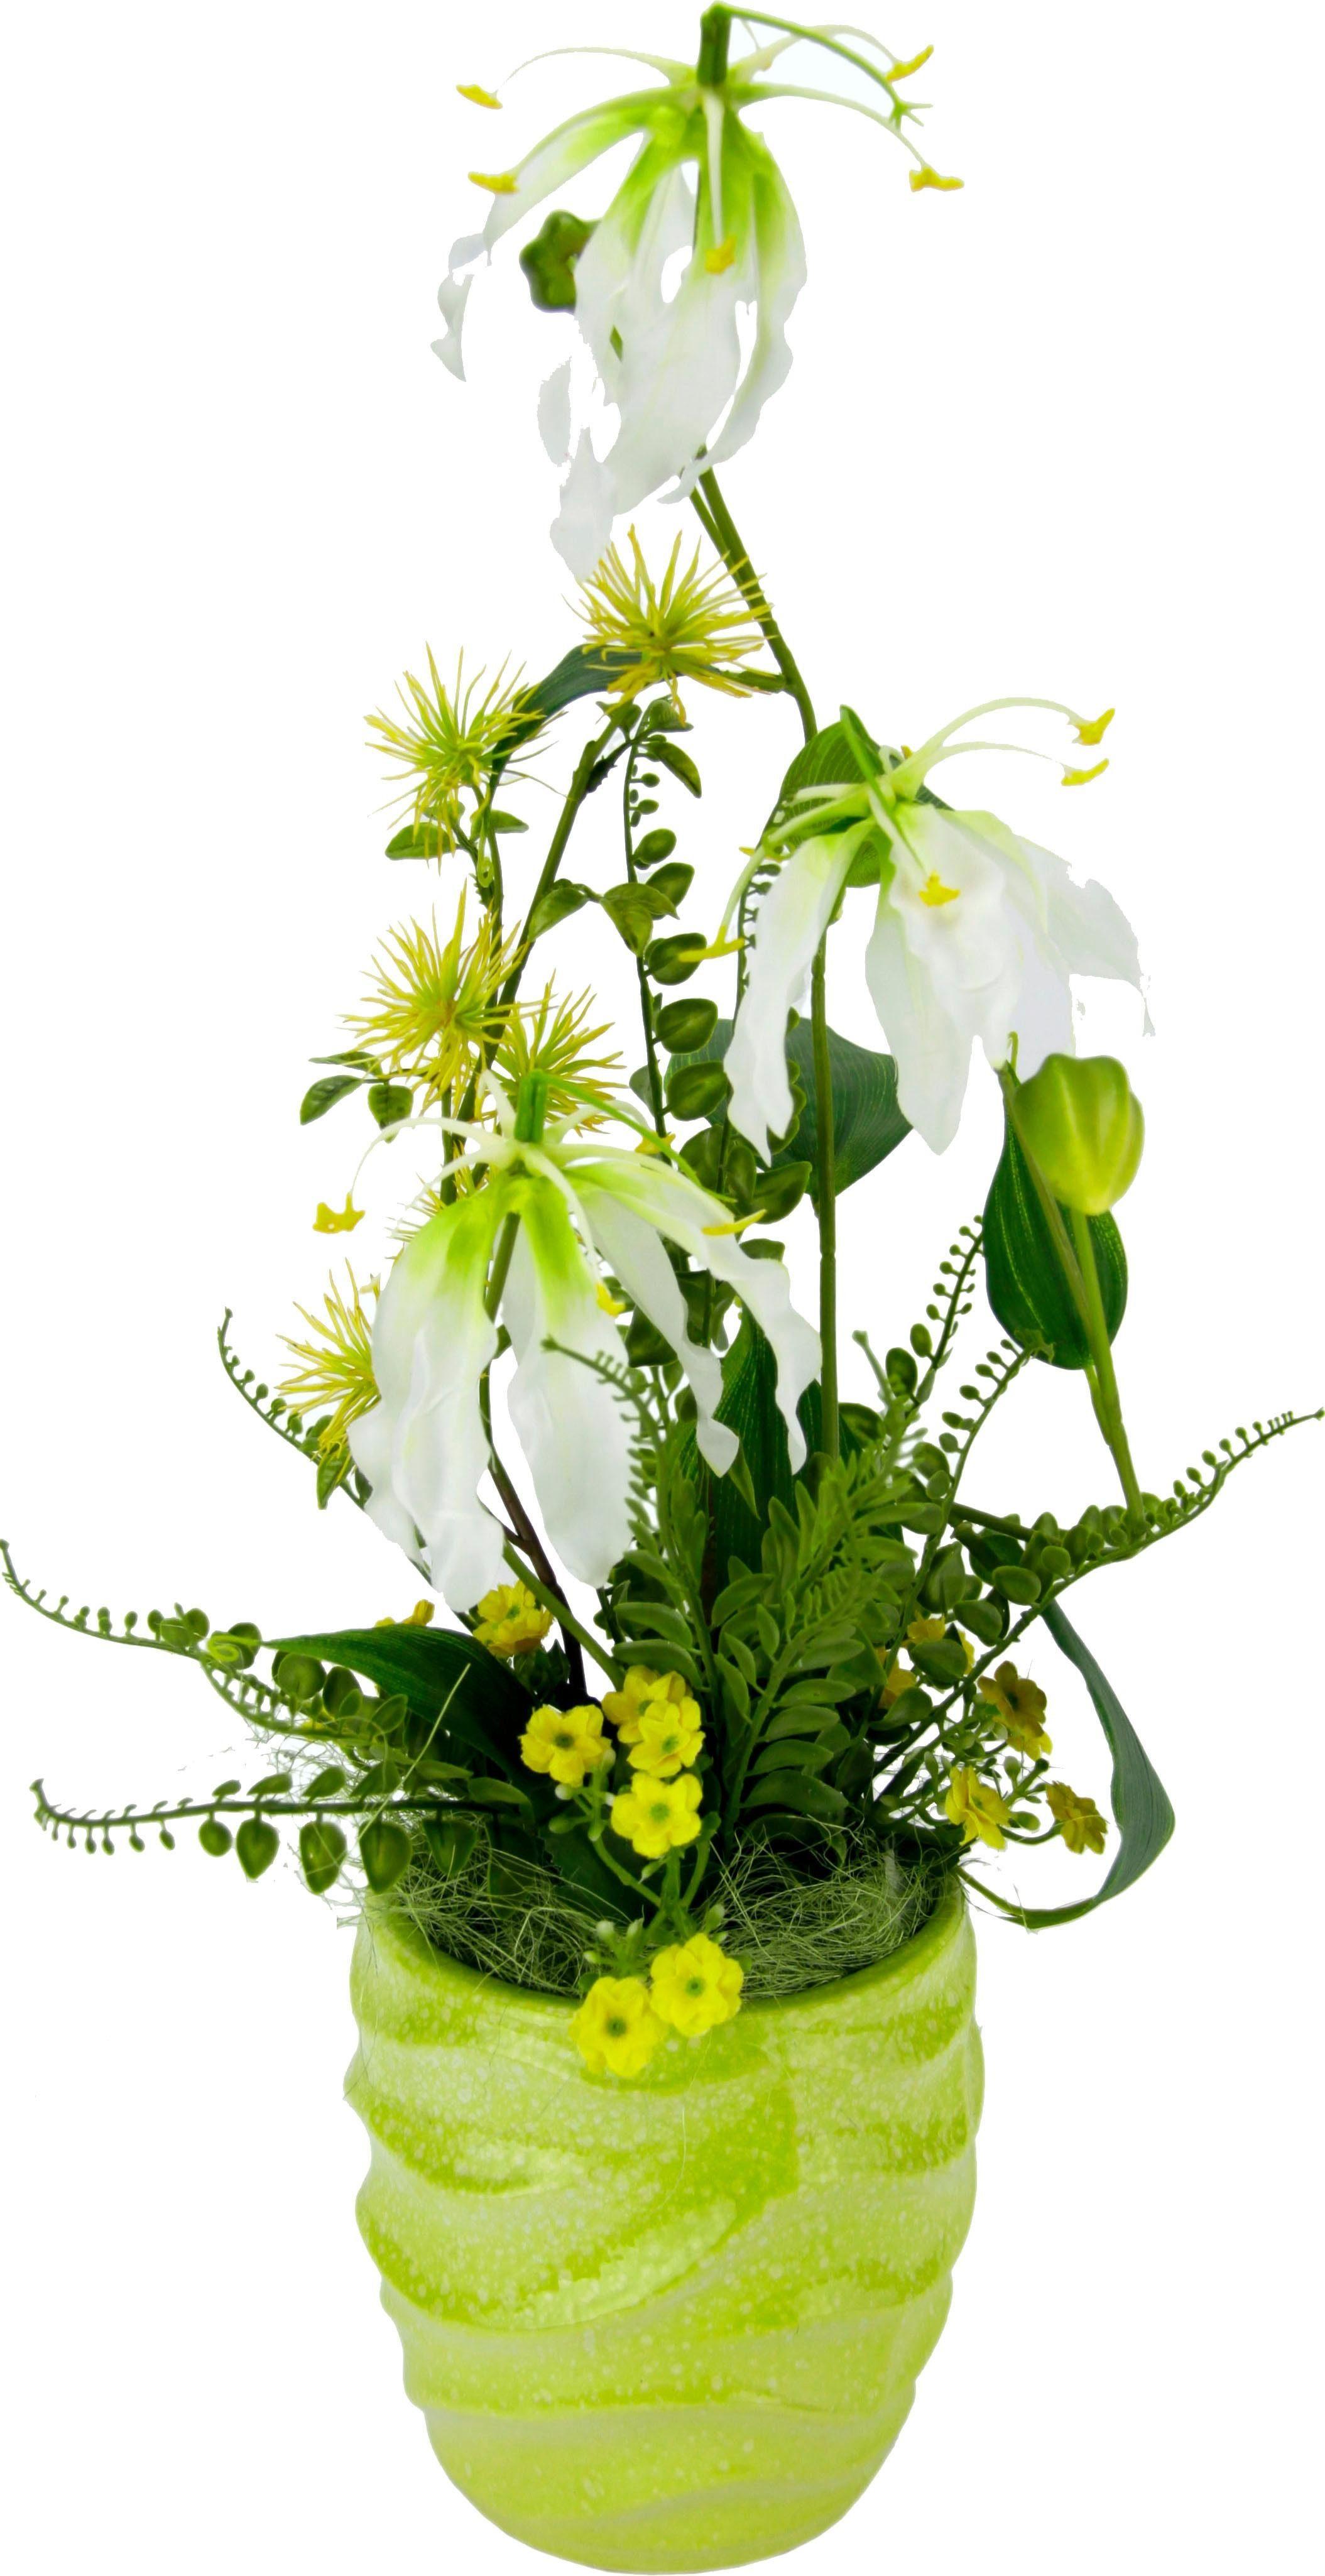 Kunstblume Gesteck Gloriosa im Topf, Höhe 53 cm,